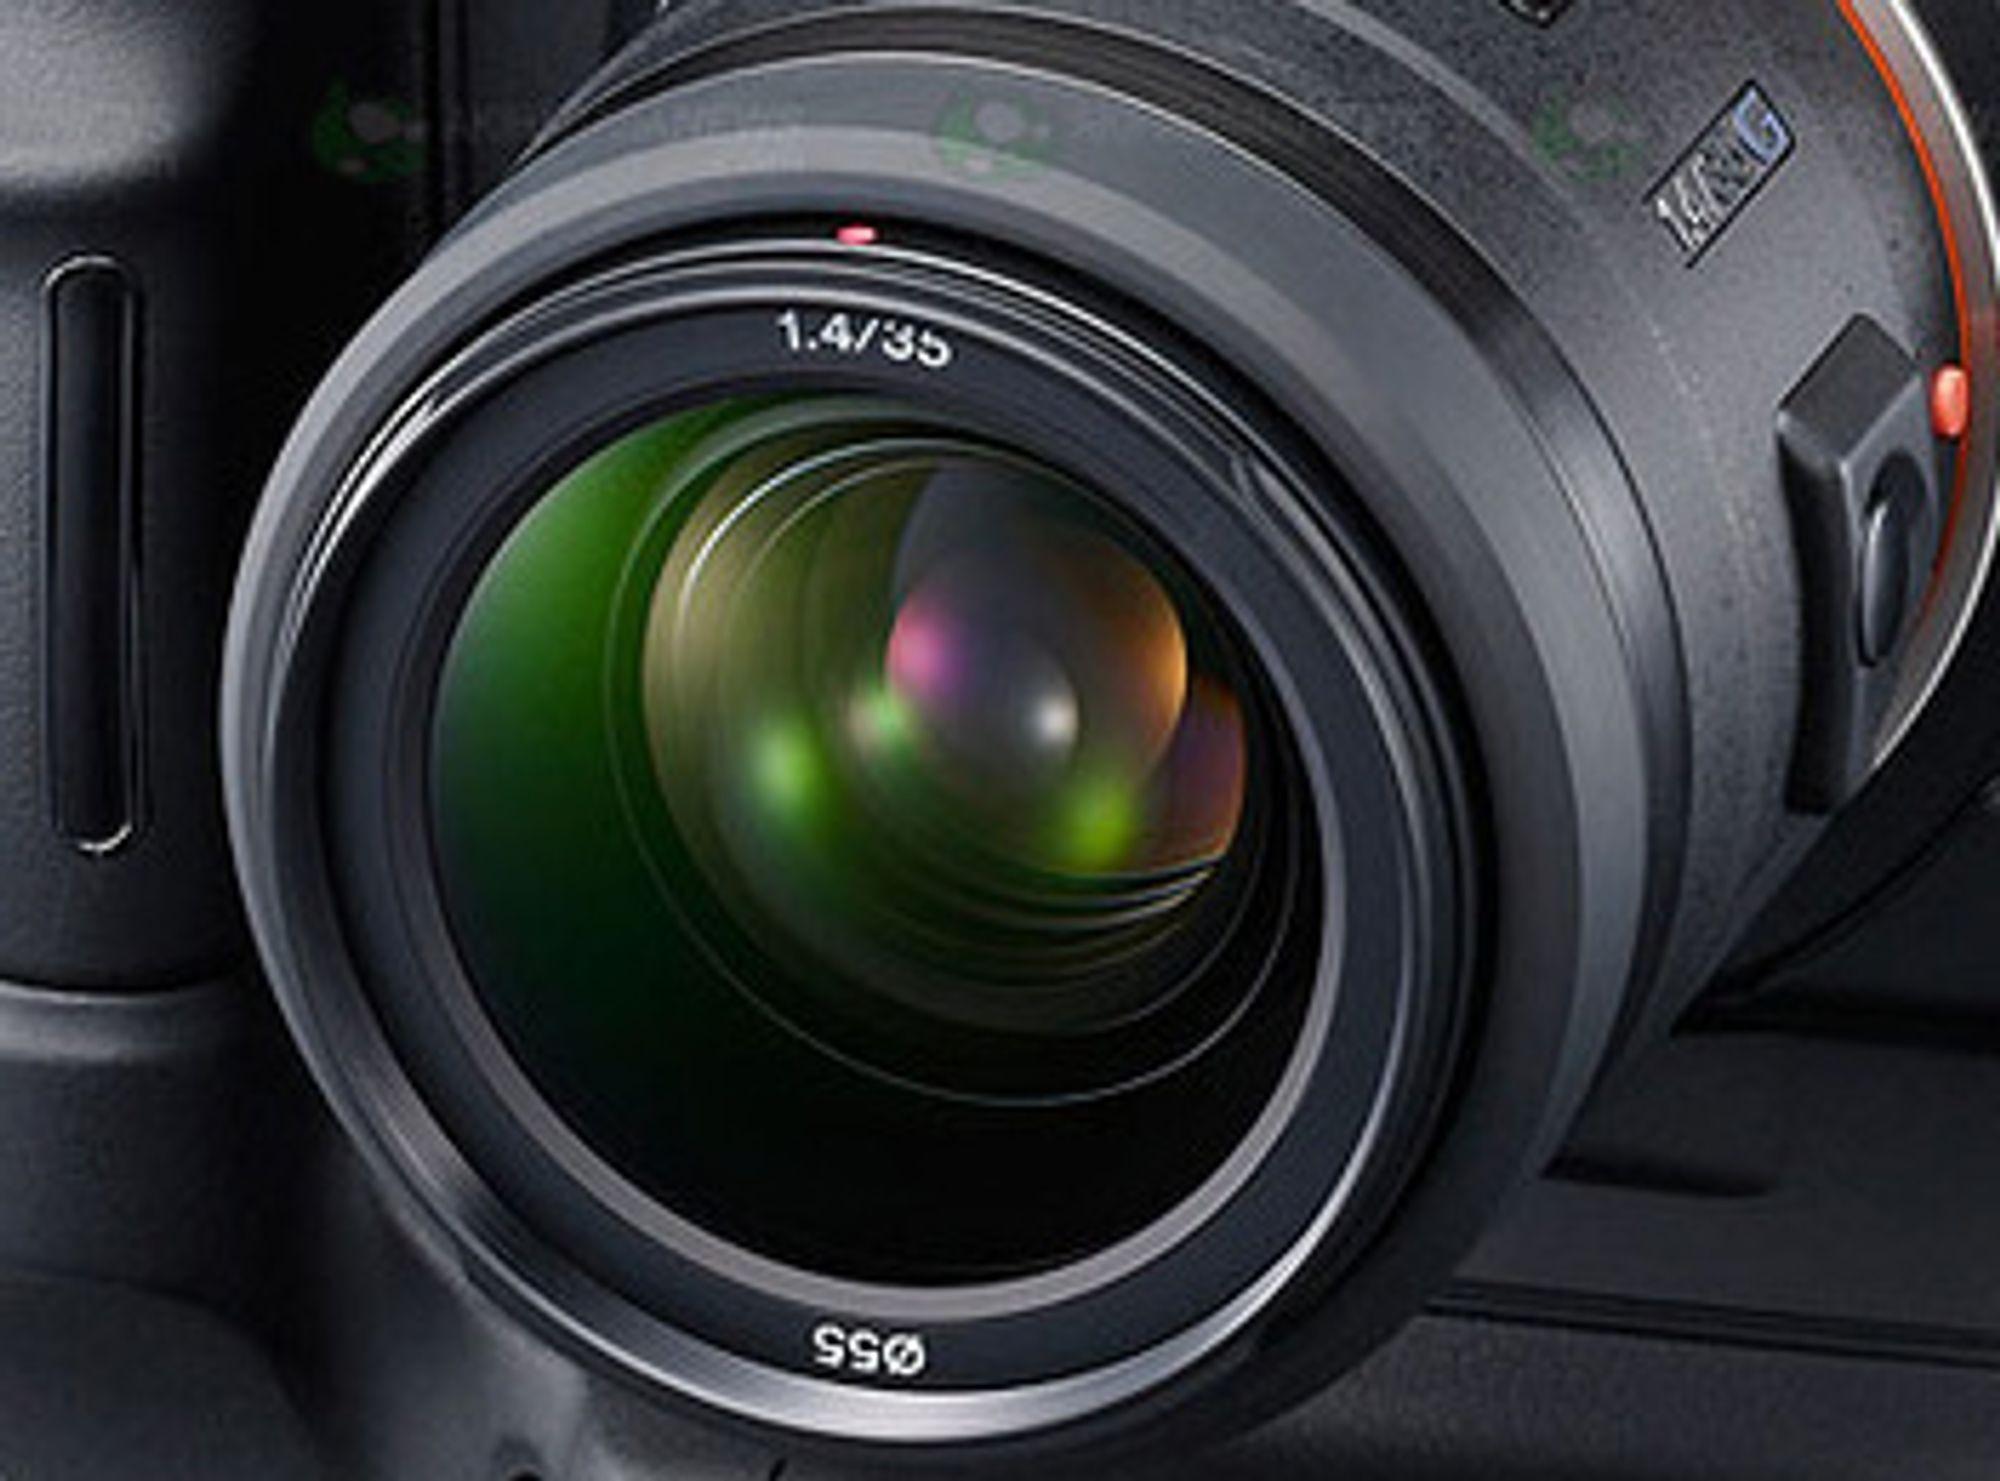 Kamera. Megapisekl Gigapiksel. Digitalt kamera. Oppløsning. Digitale bilder. Digital speilrefleks.